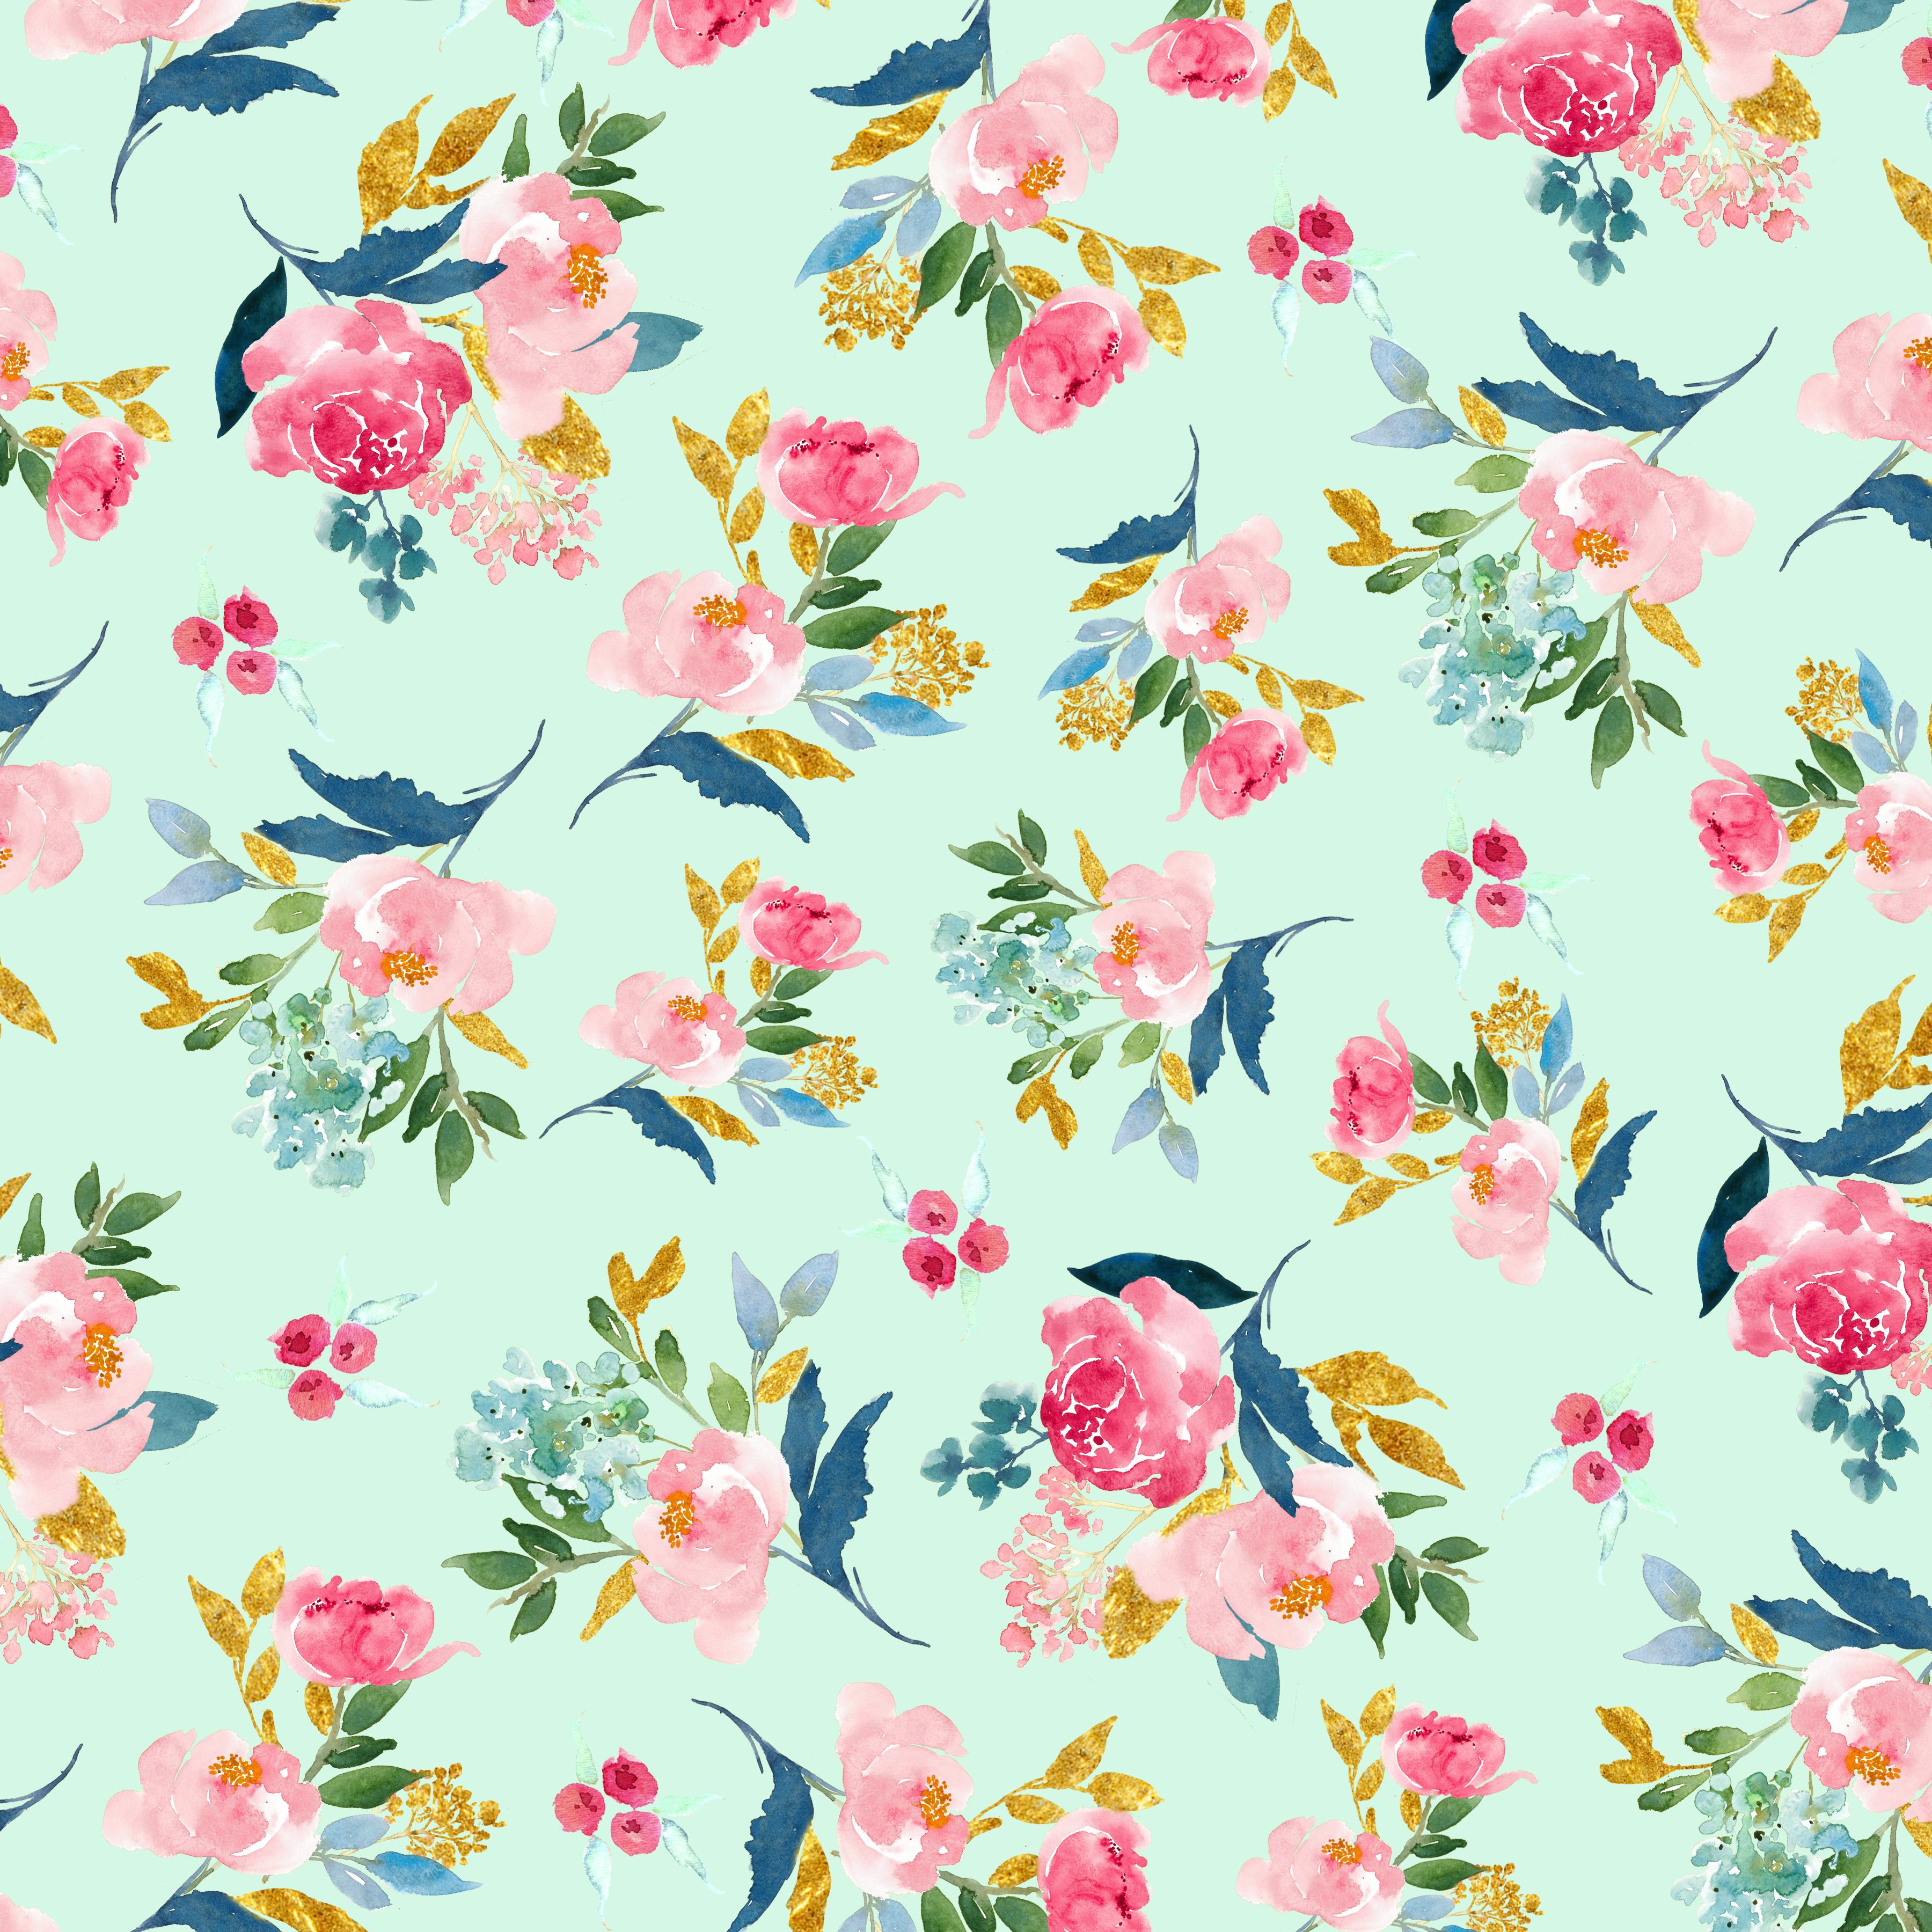 Free Digital Scrapbook Paper-Summer Love - Free Pretty Things For You - Free Printable Fall Scrapbook Paper